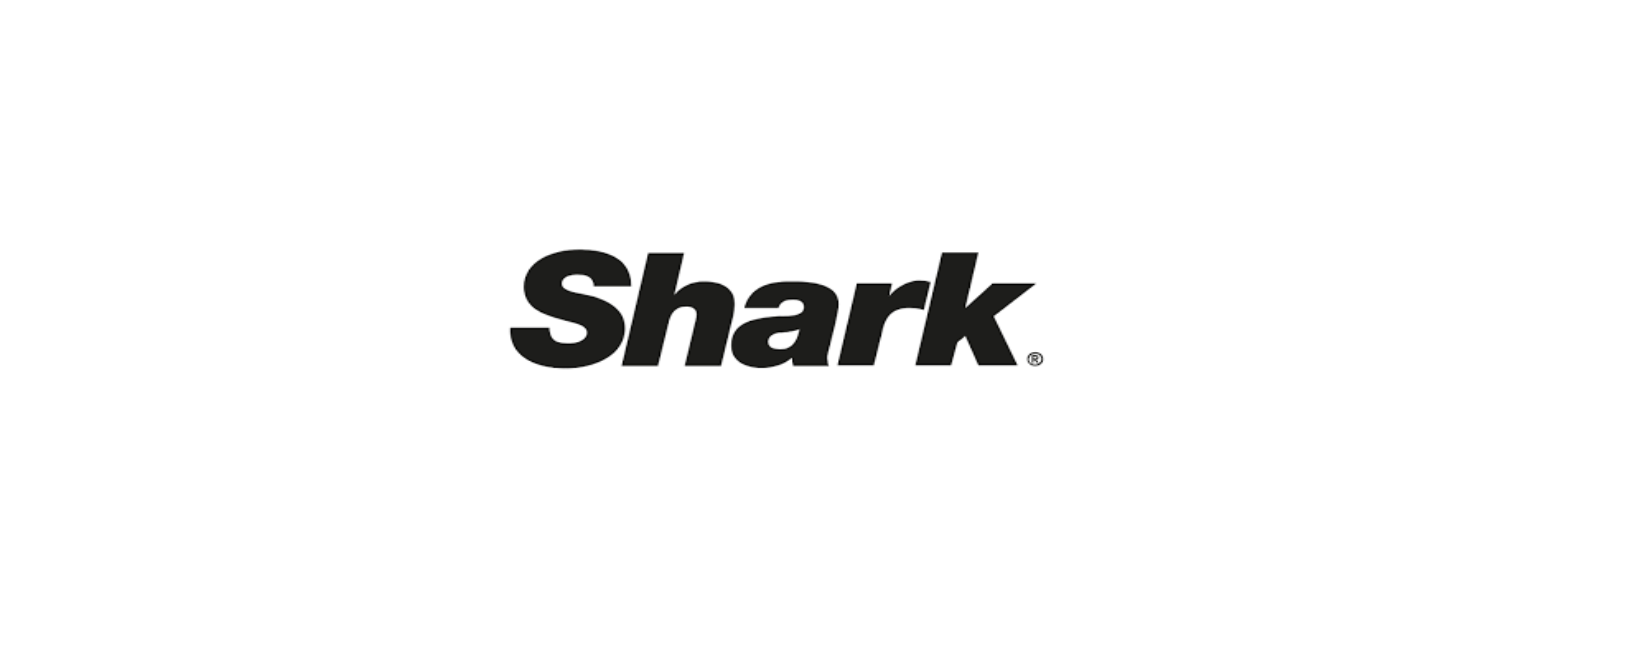 Sharkclean Discount Code 2021